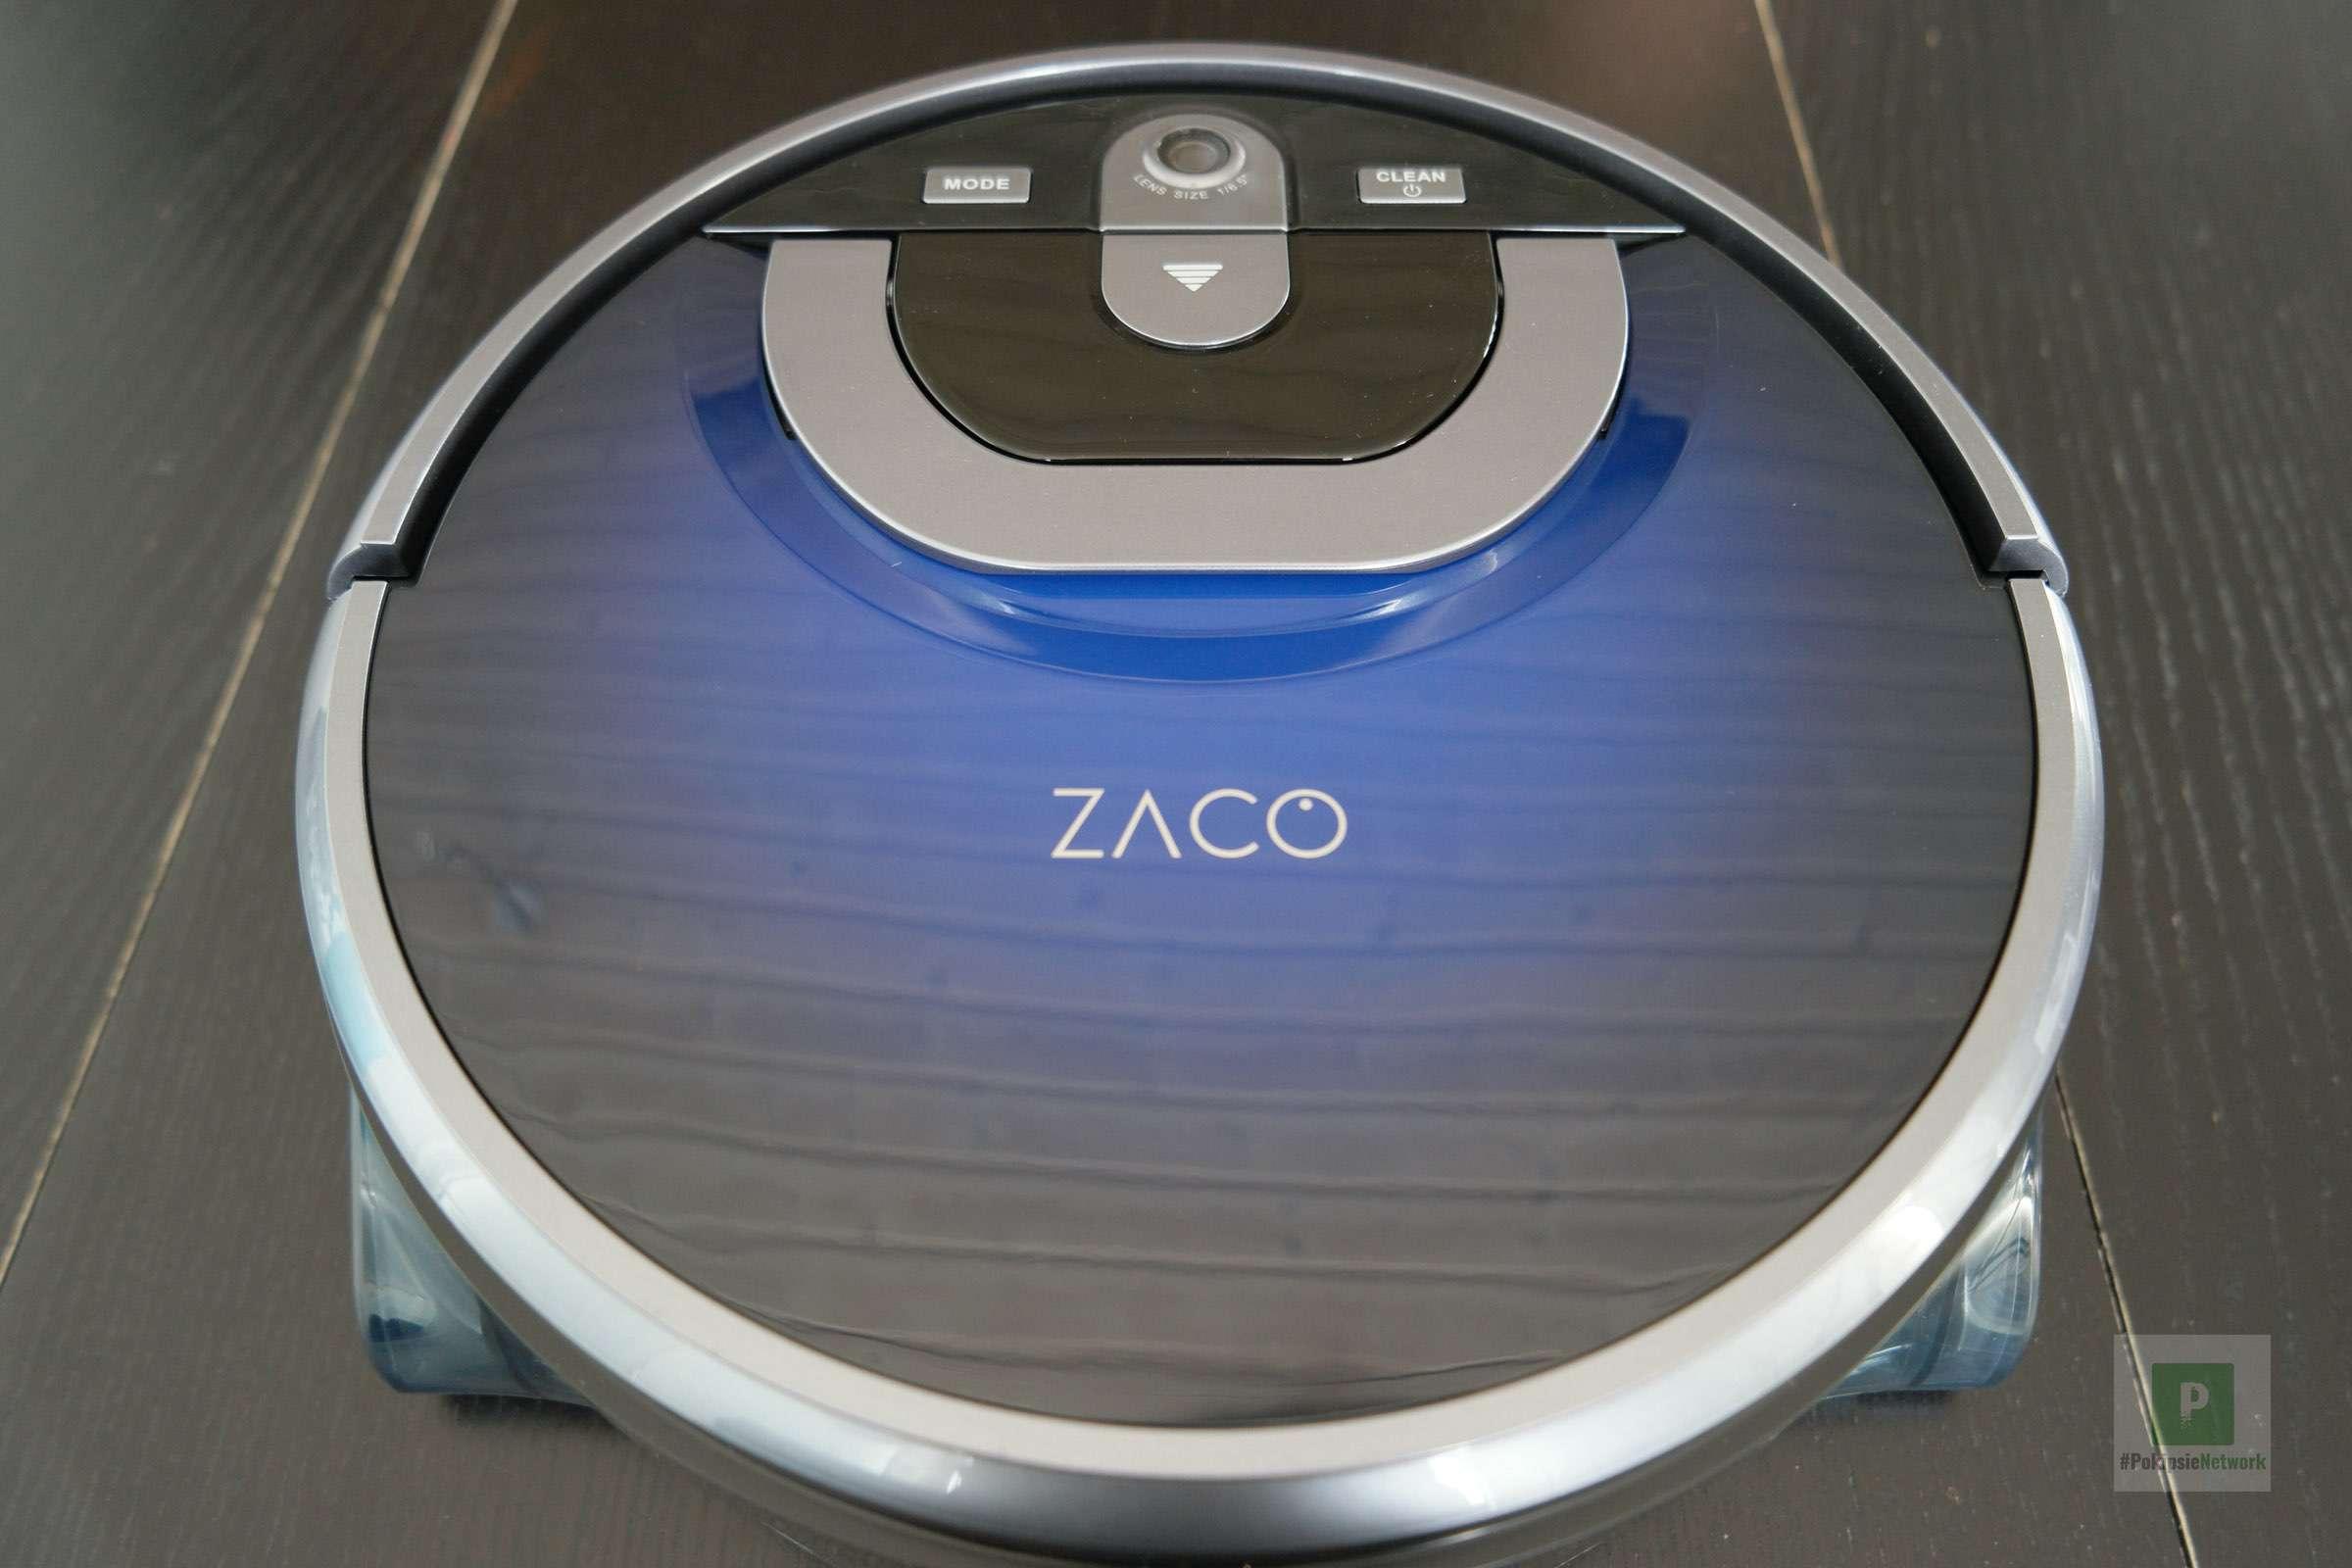 Zaco Wischroboter